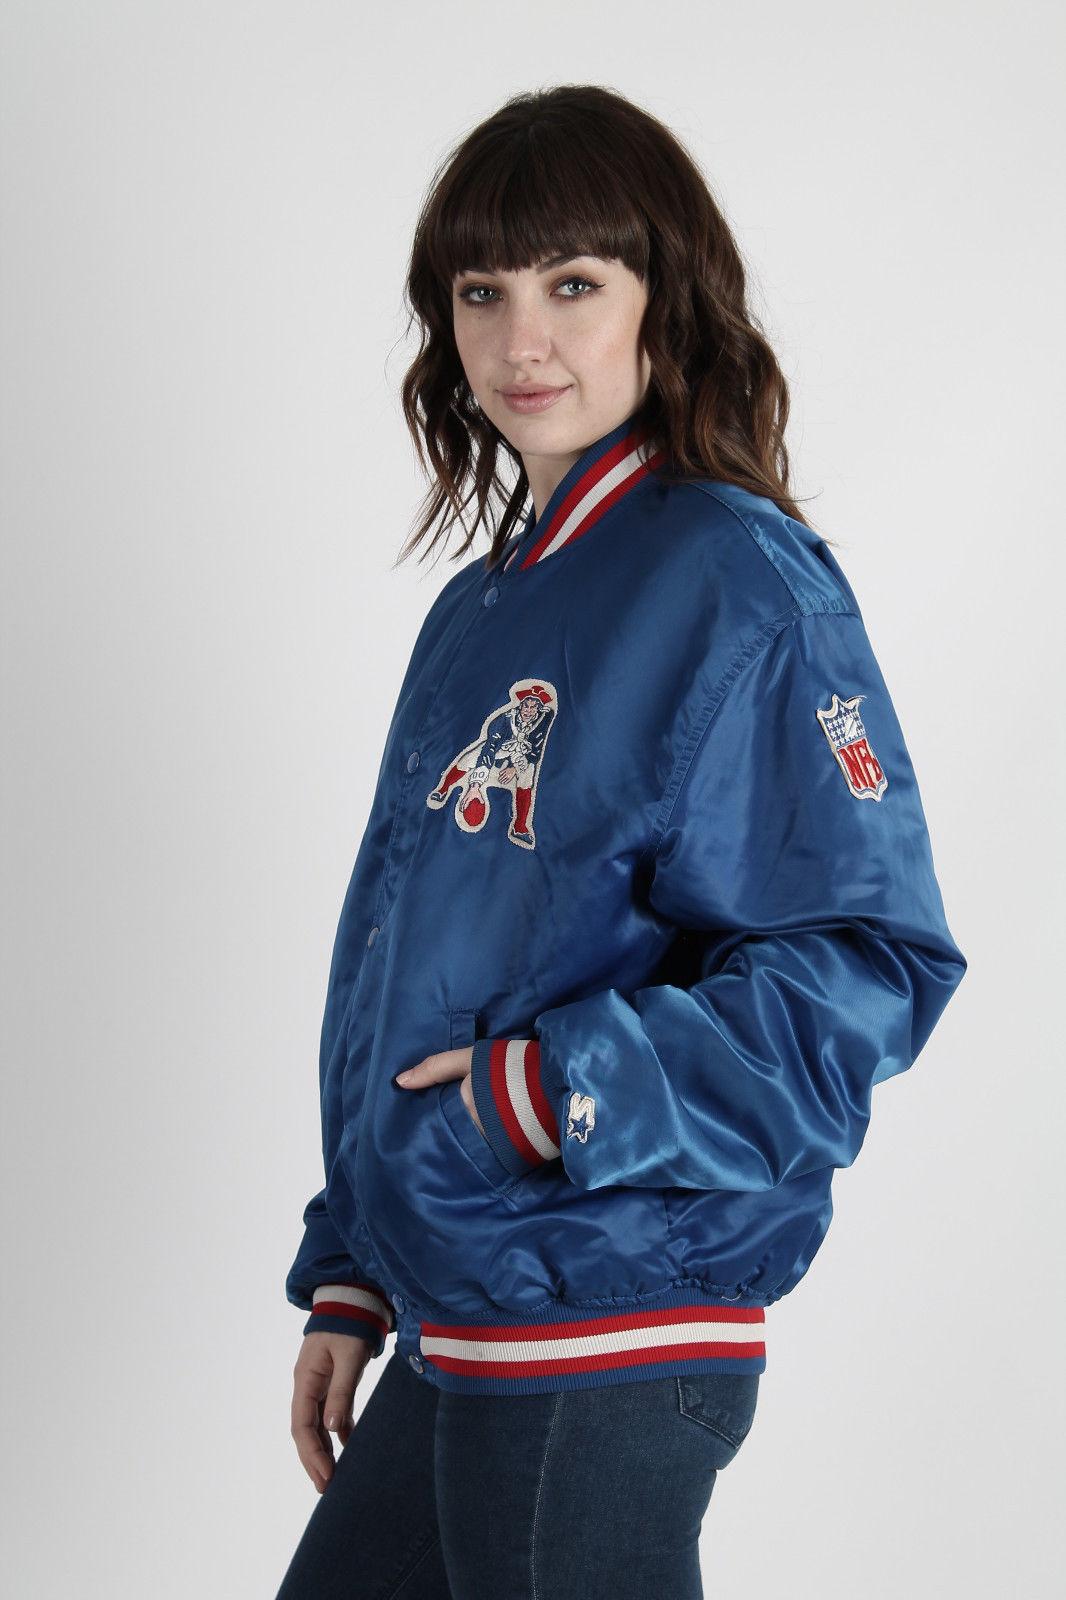 A woman models a vintage satin patriots jacket